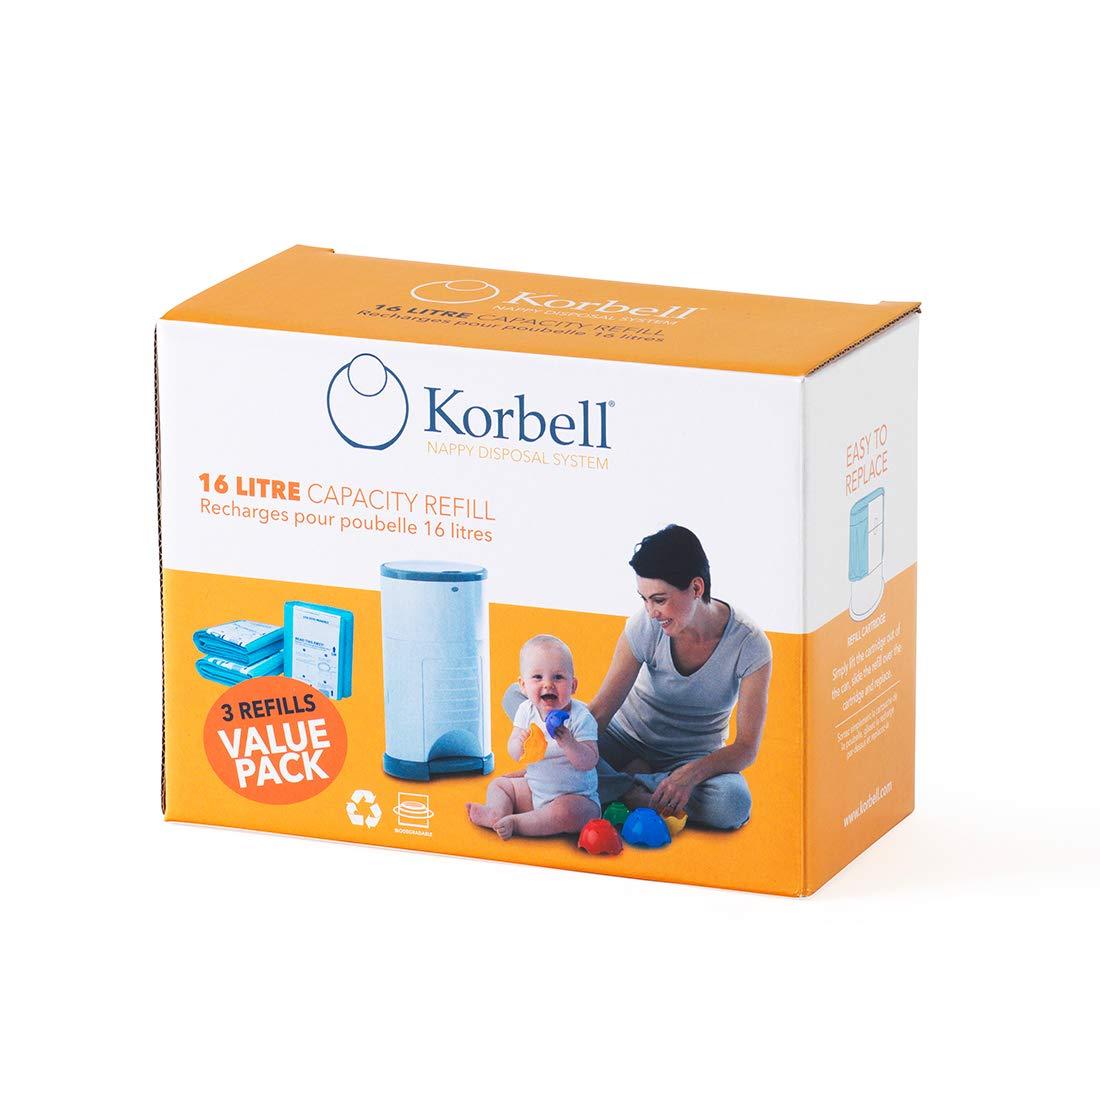 Korbell KR250DR1B - Bolsas de recambio para papelera de pañales, tamaño normal (3 packs) product image